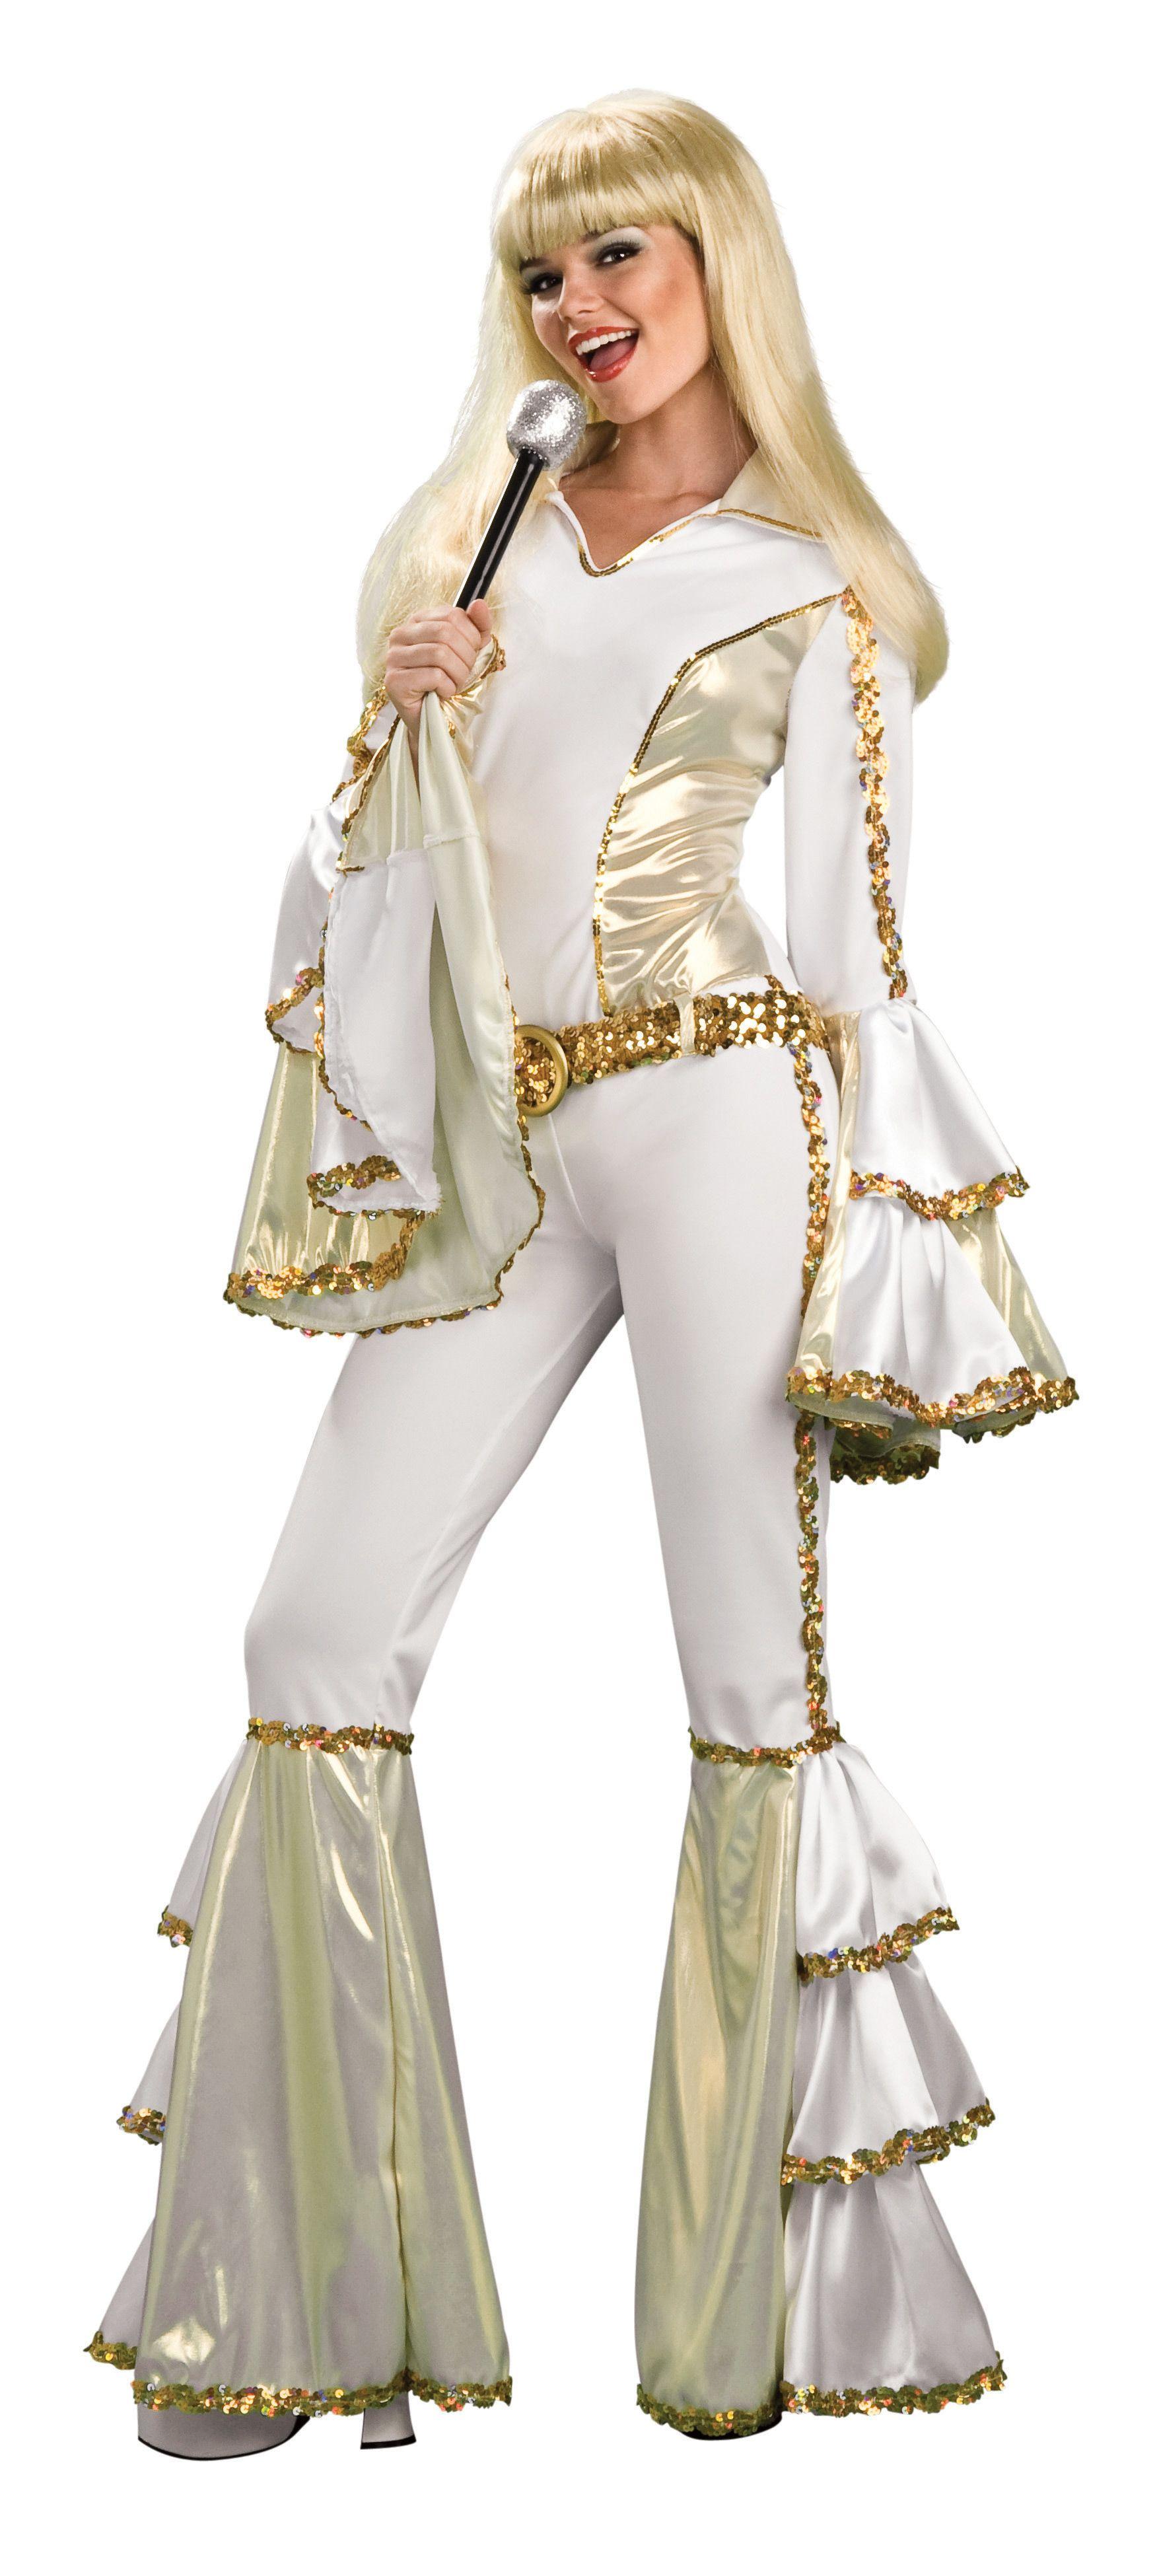 disco attire | 70s Disco Outfits Women | Disco Event | Pinterest ...